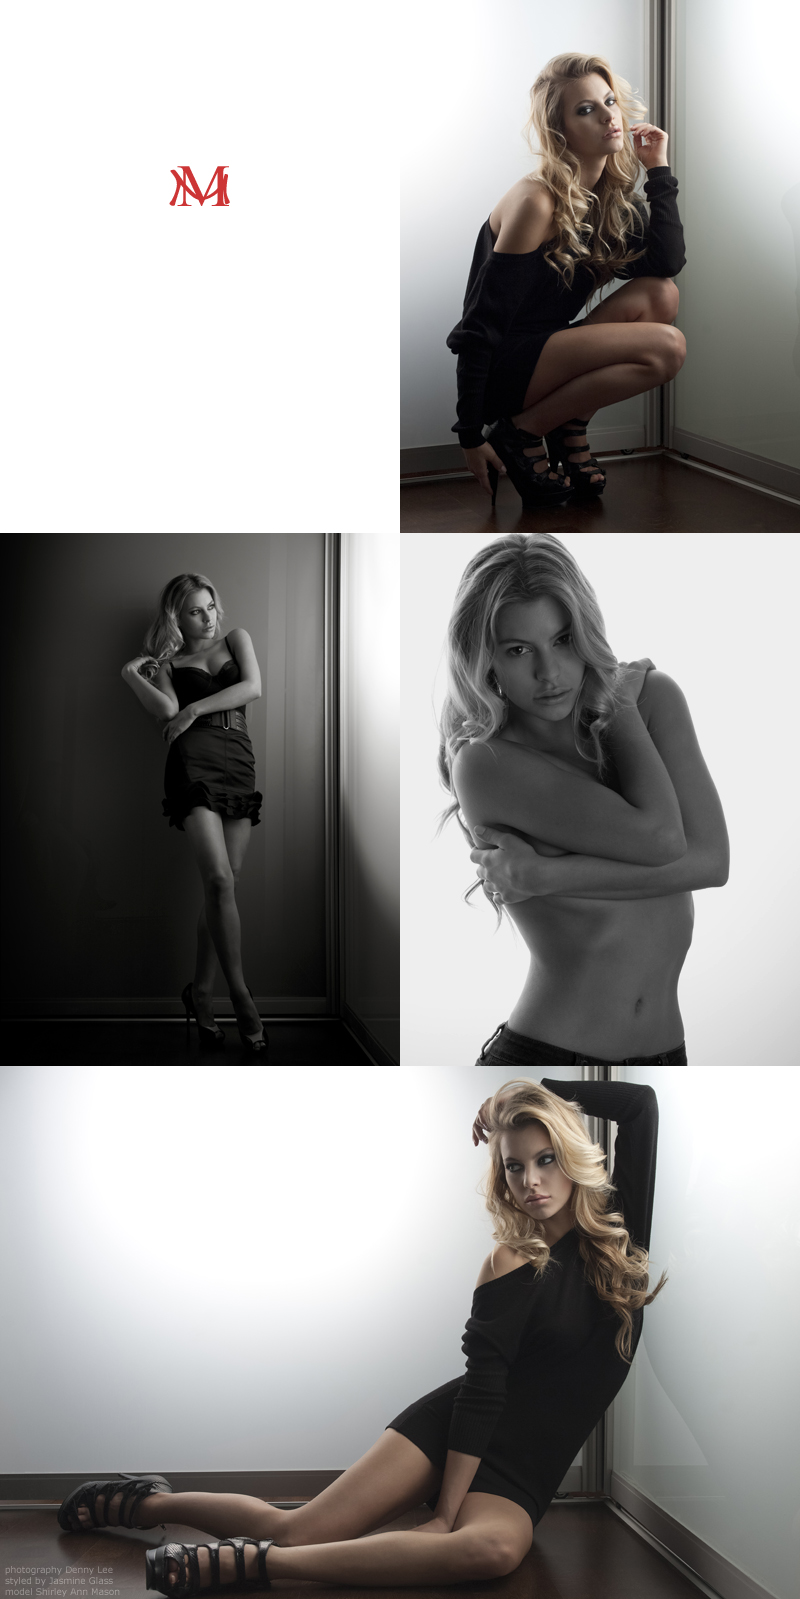 May 03, 2010 dennyleephotography.com